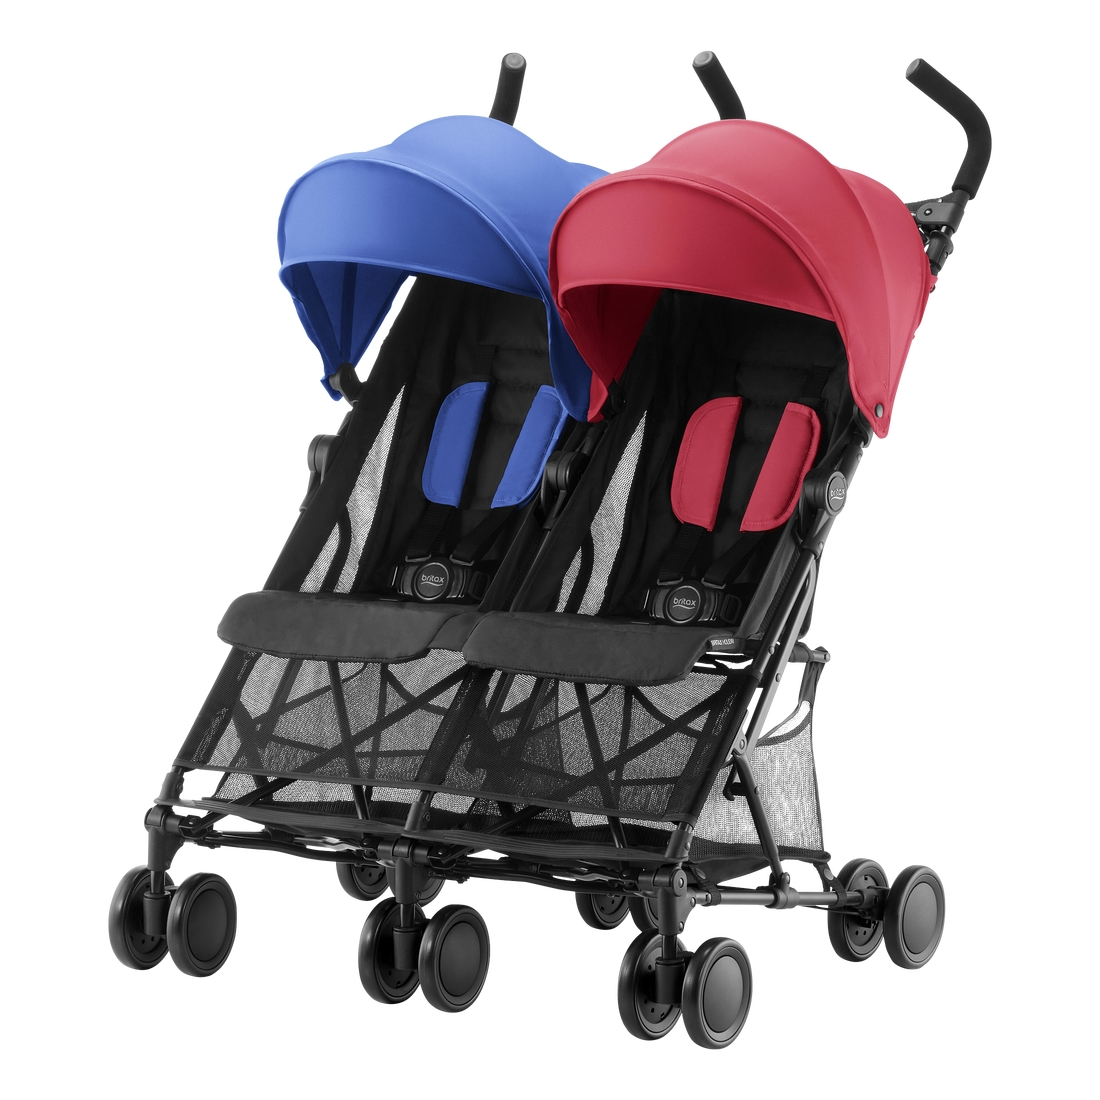 Carro gémeos/2 crianças Britax Holiday Double Stroller